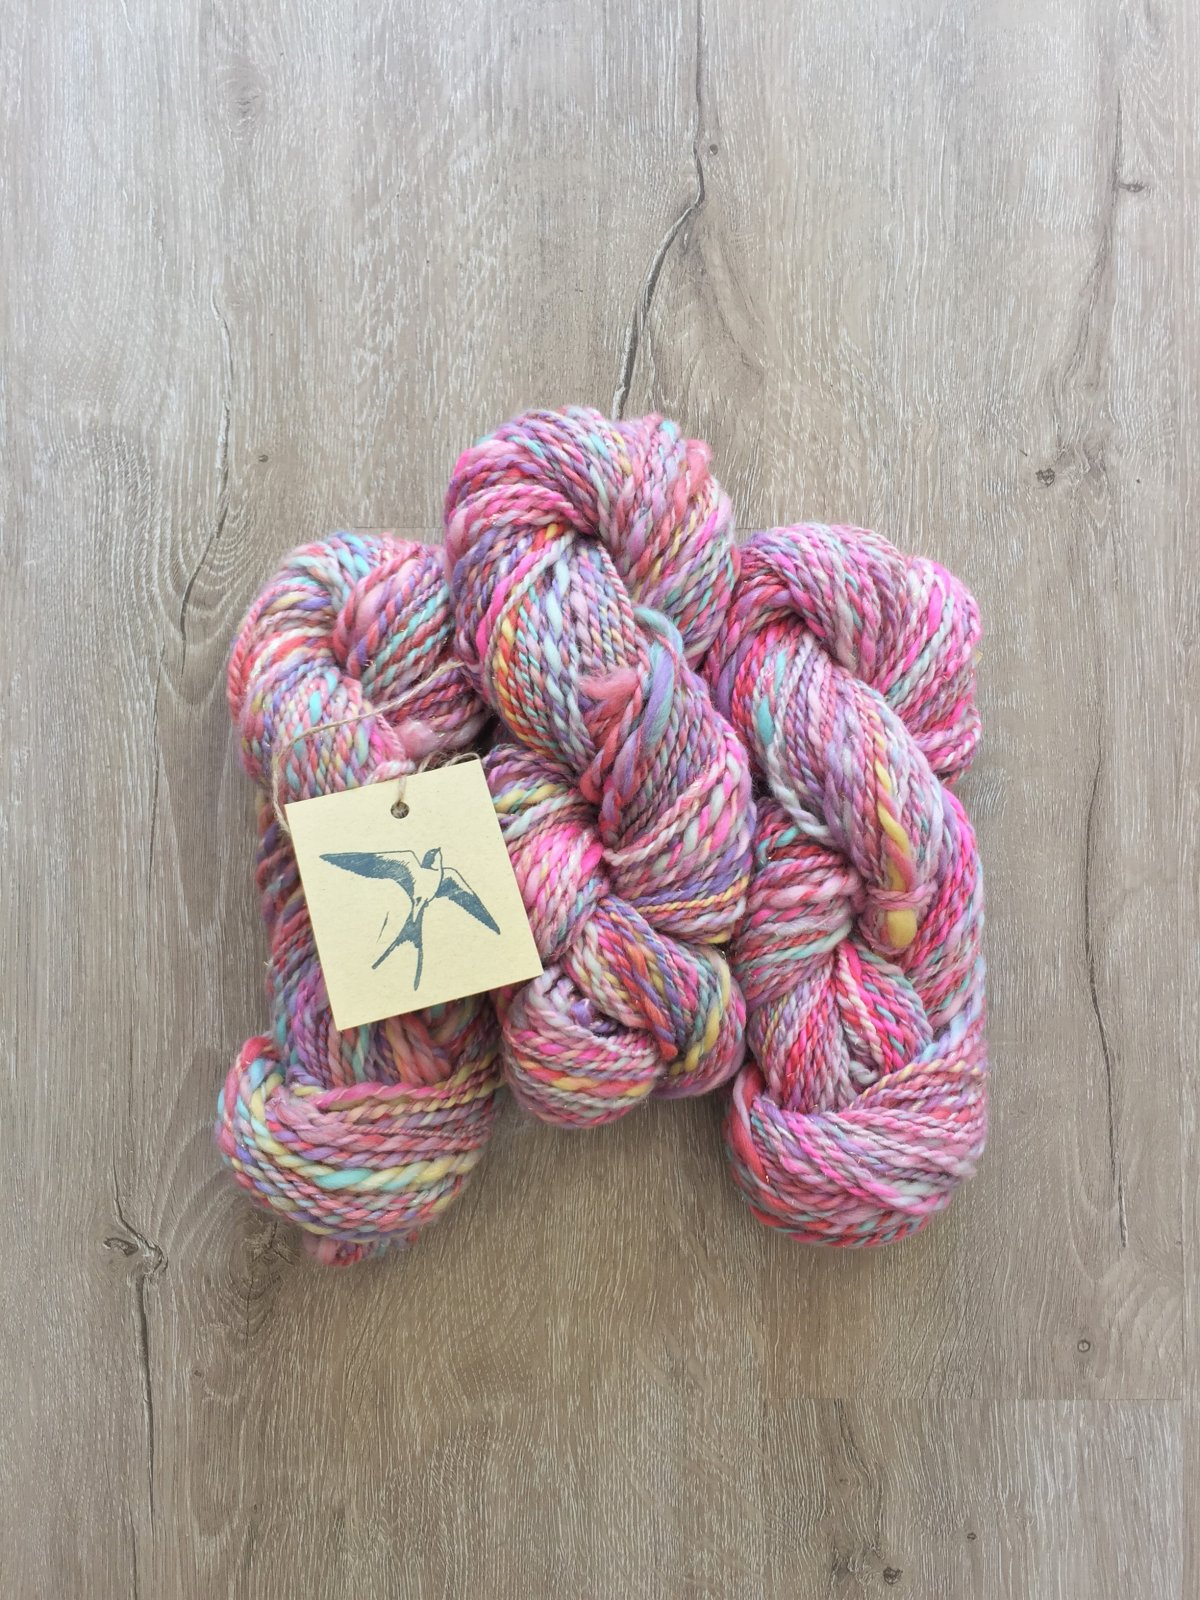 Enchanted Unicorn Handspun Merino Wool Sparkle blend